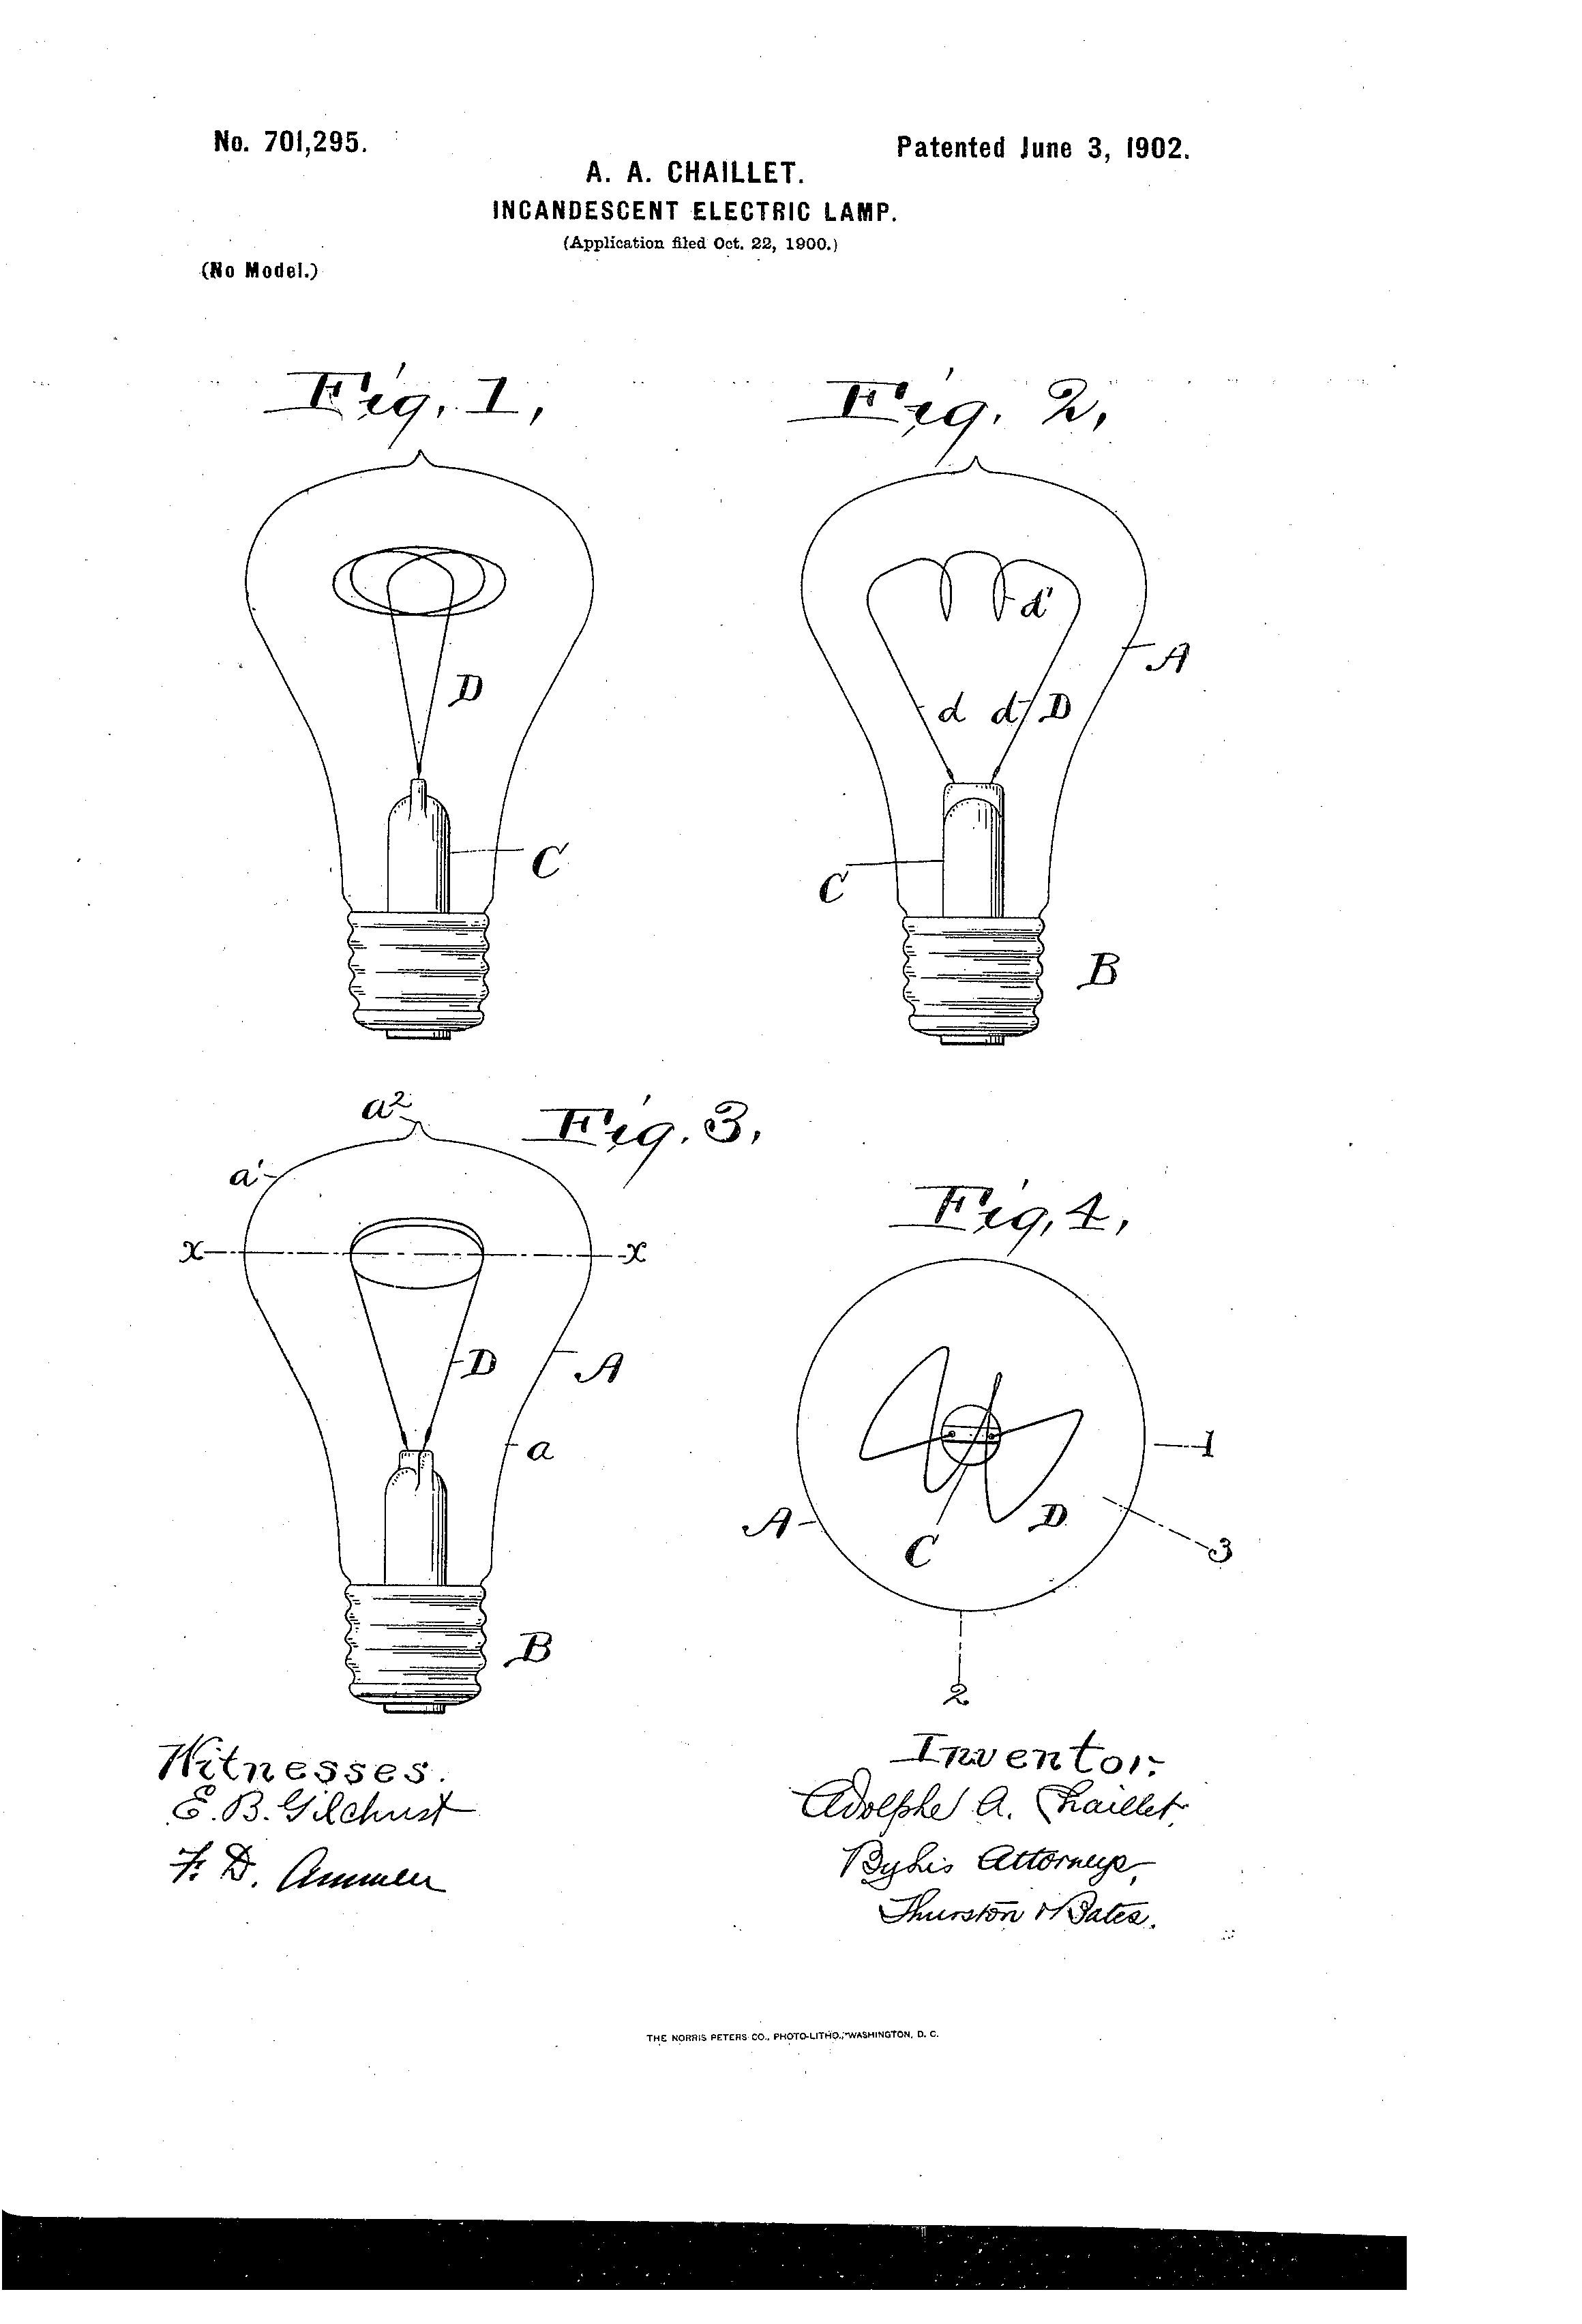 Das Original-Patent von Adolphe Chaillet (Bildquelle: priceonomics.com)